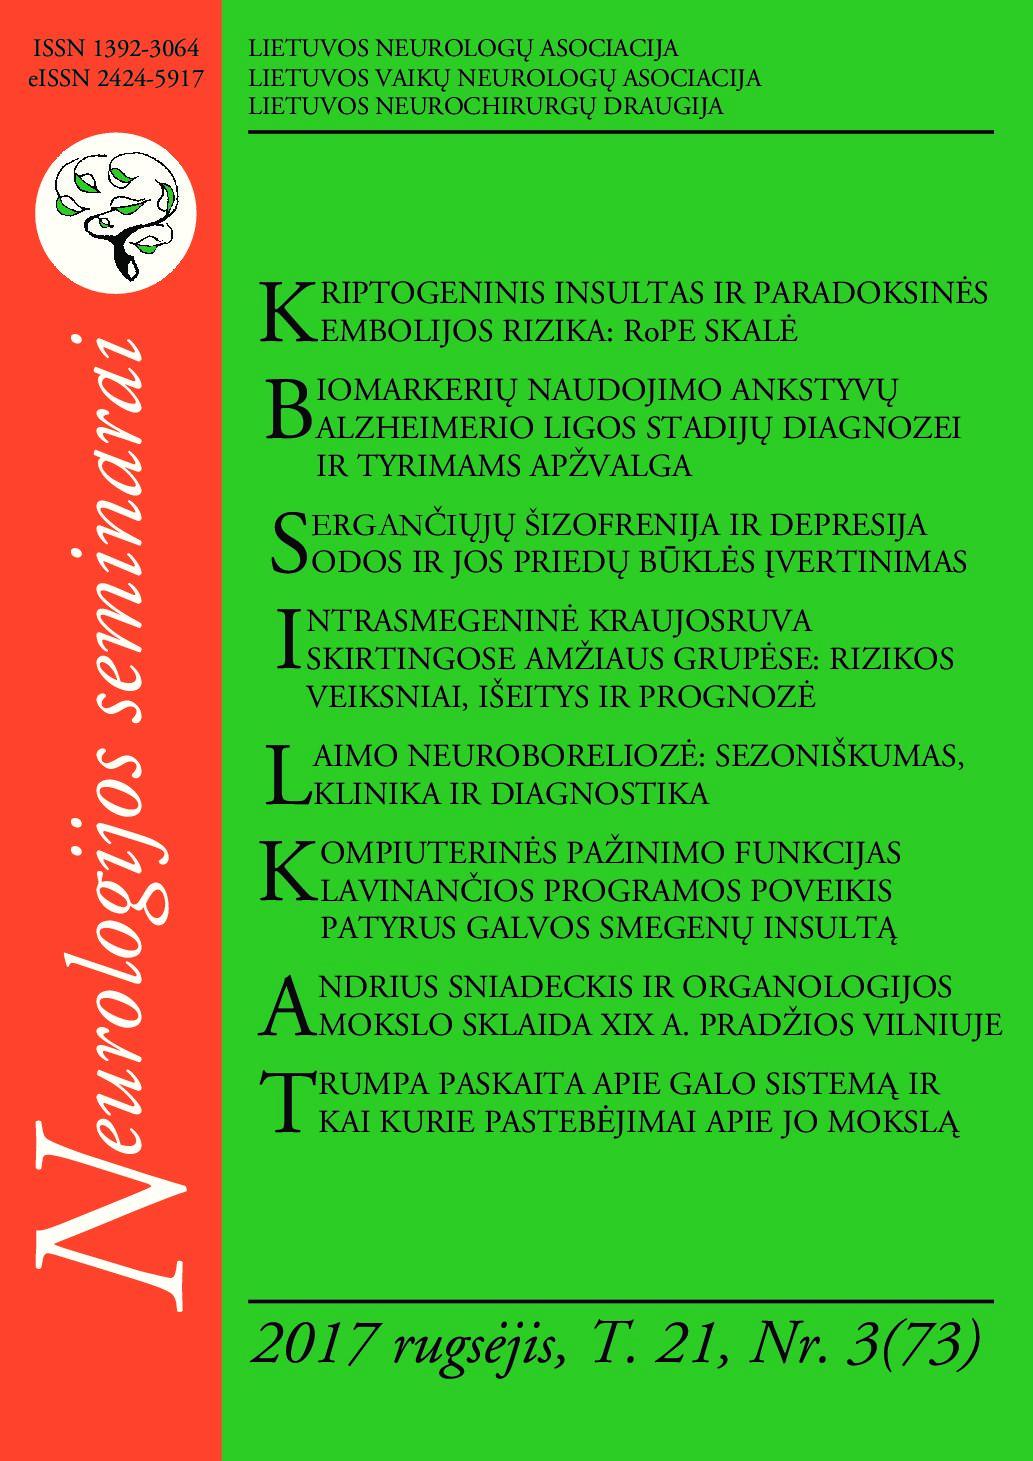 hipertenzijos ligos charakteristikos)